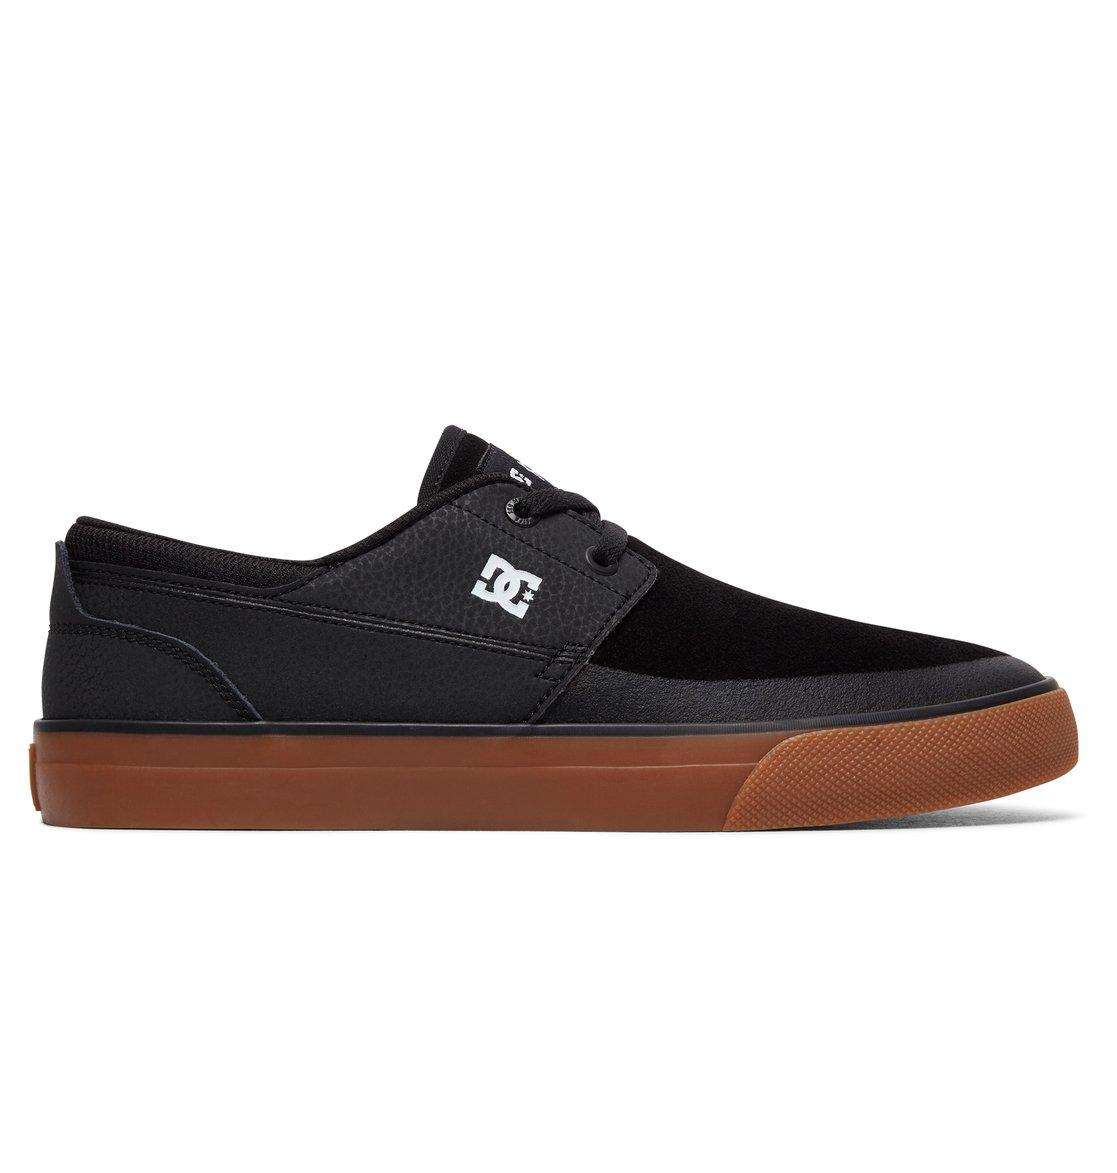 Wes Kremer 2 S - Skate Shoes for Men